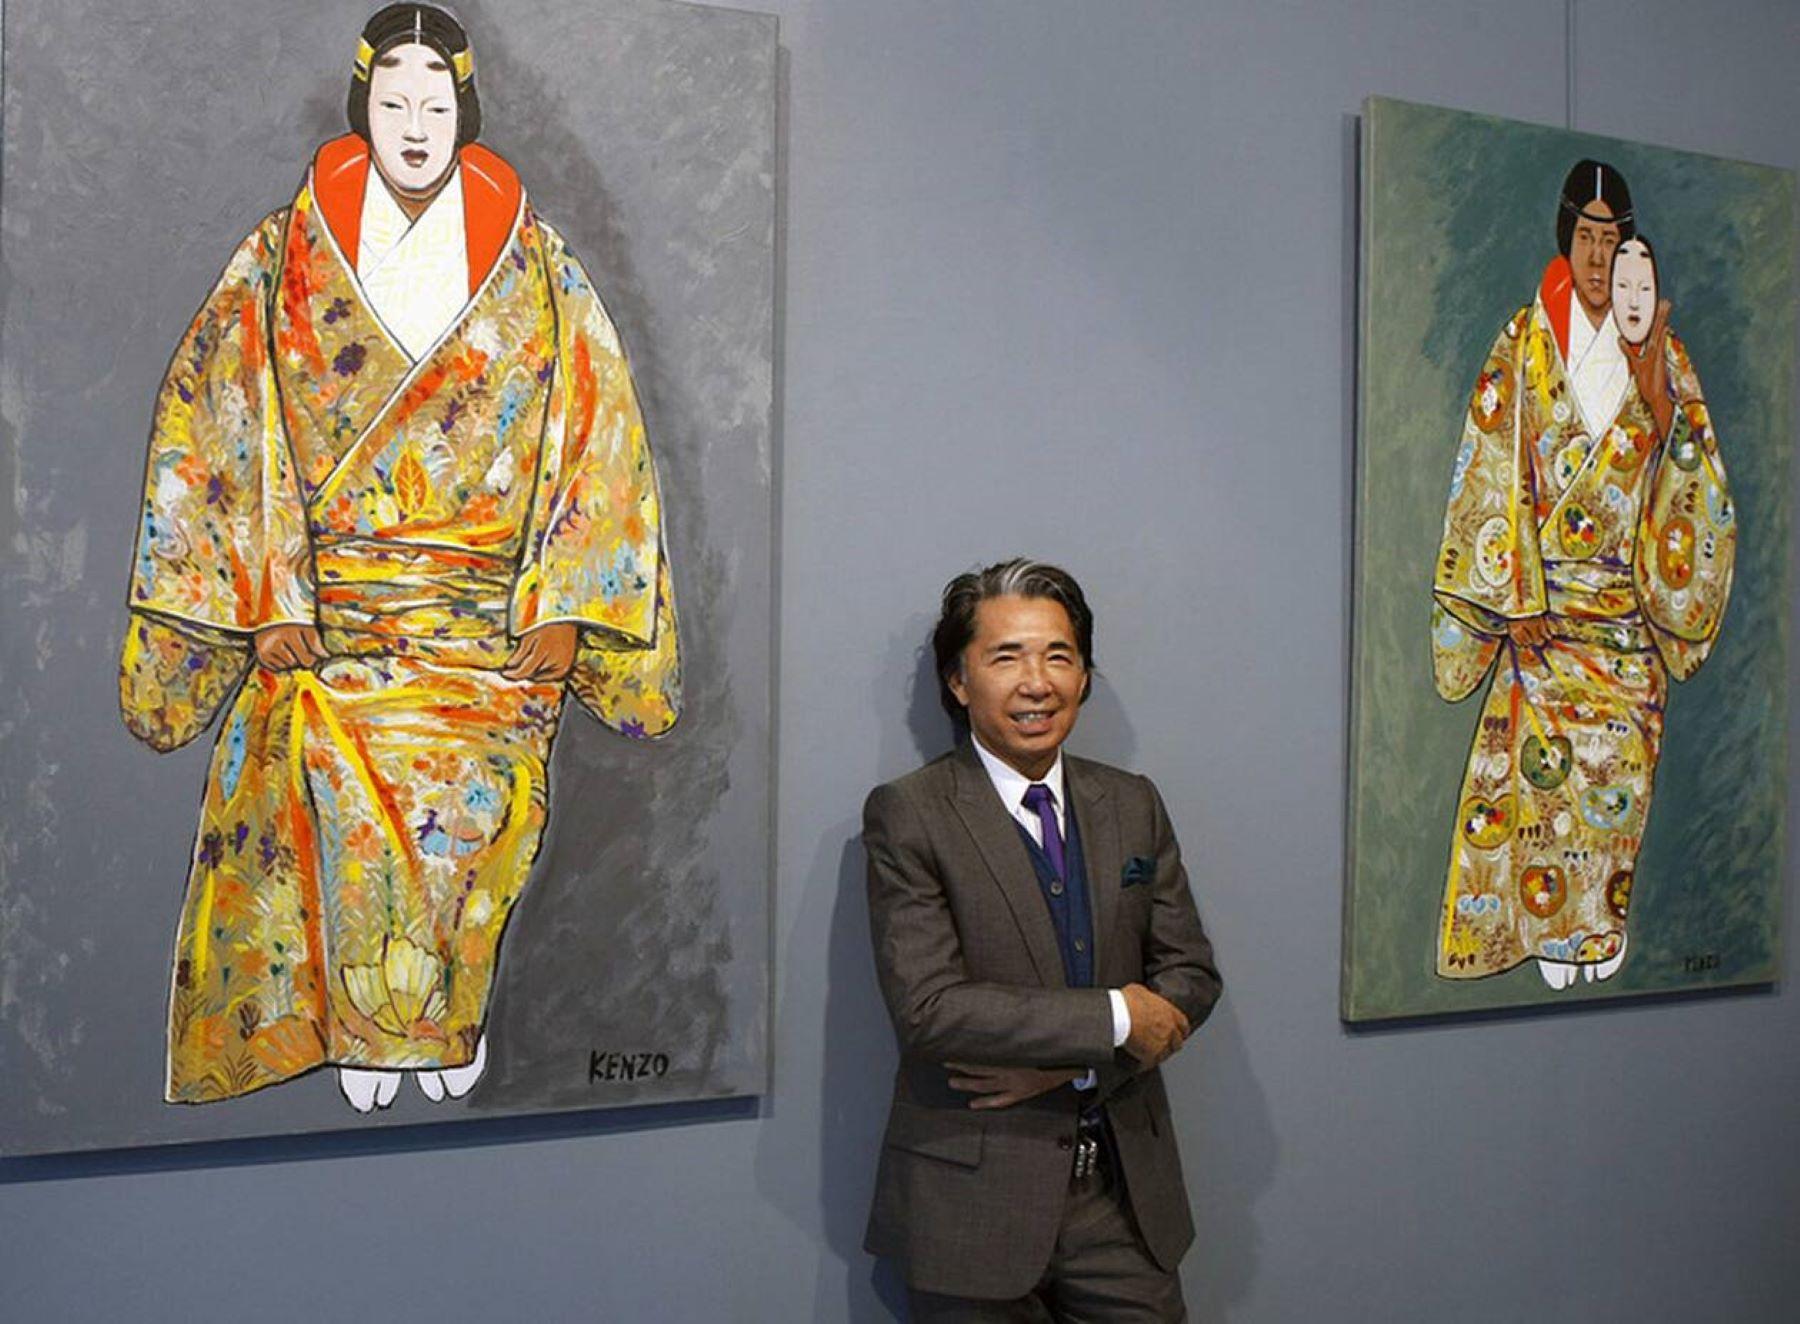 KenzoTakada: Πέθανε από κορωνοϊό